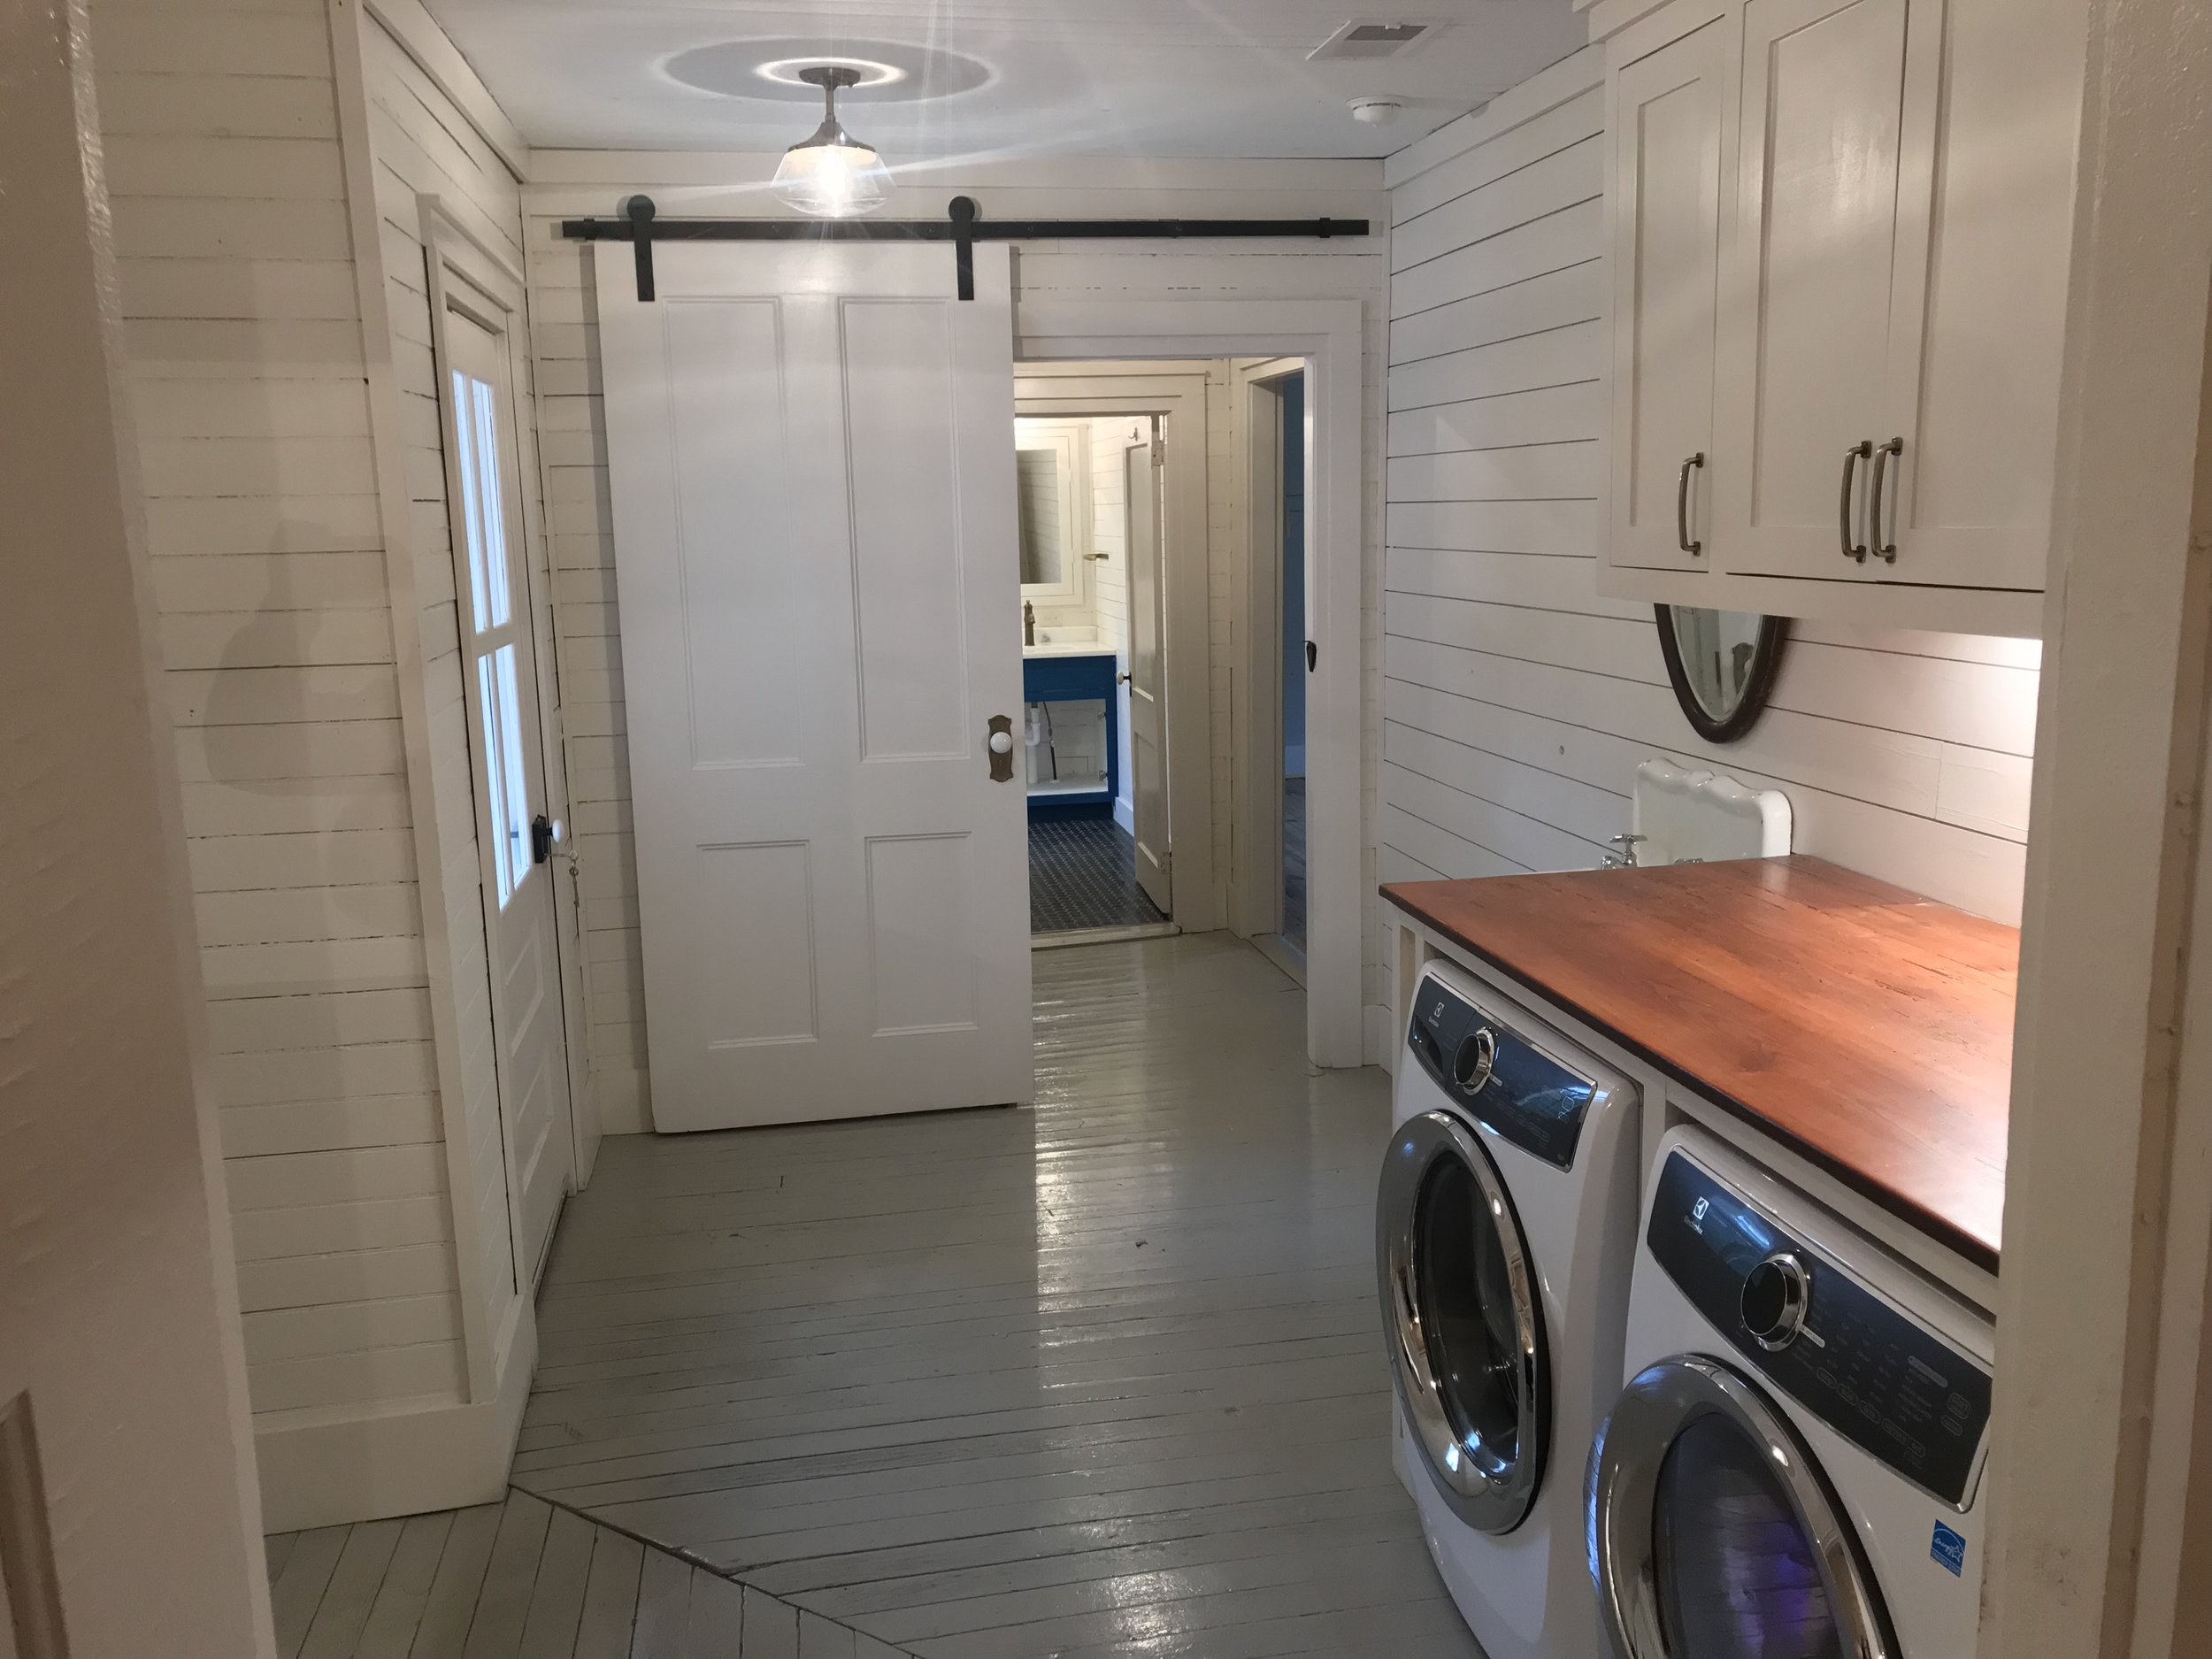 Shealy Laundry room Master Suite Progress.JPG